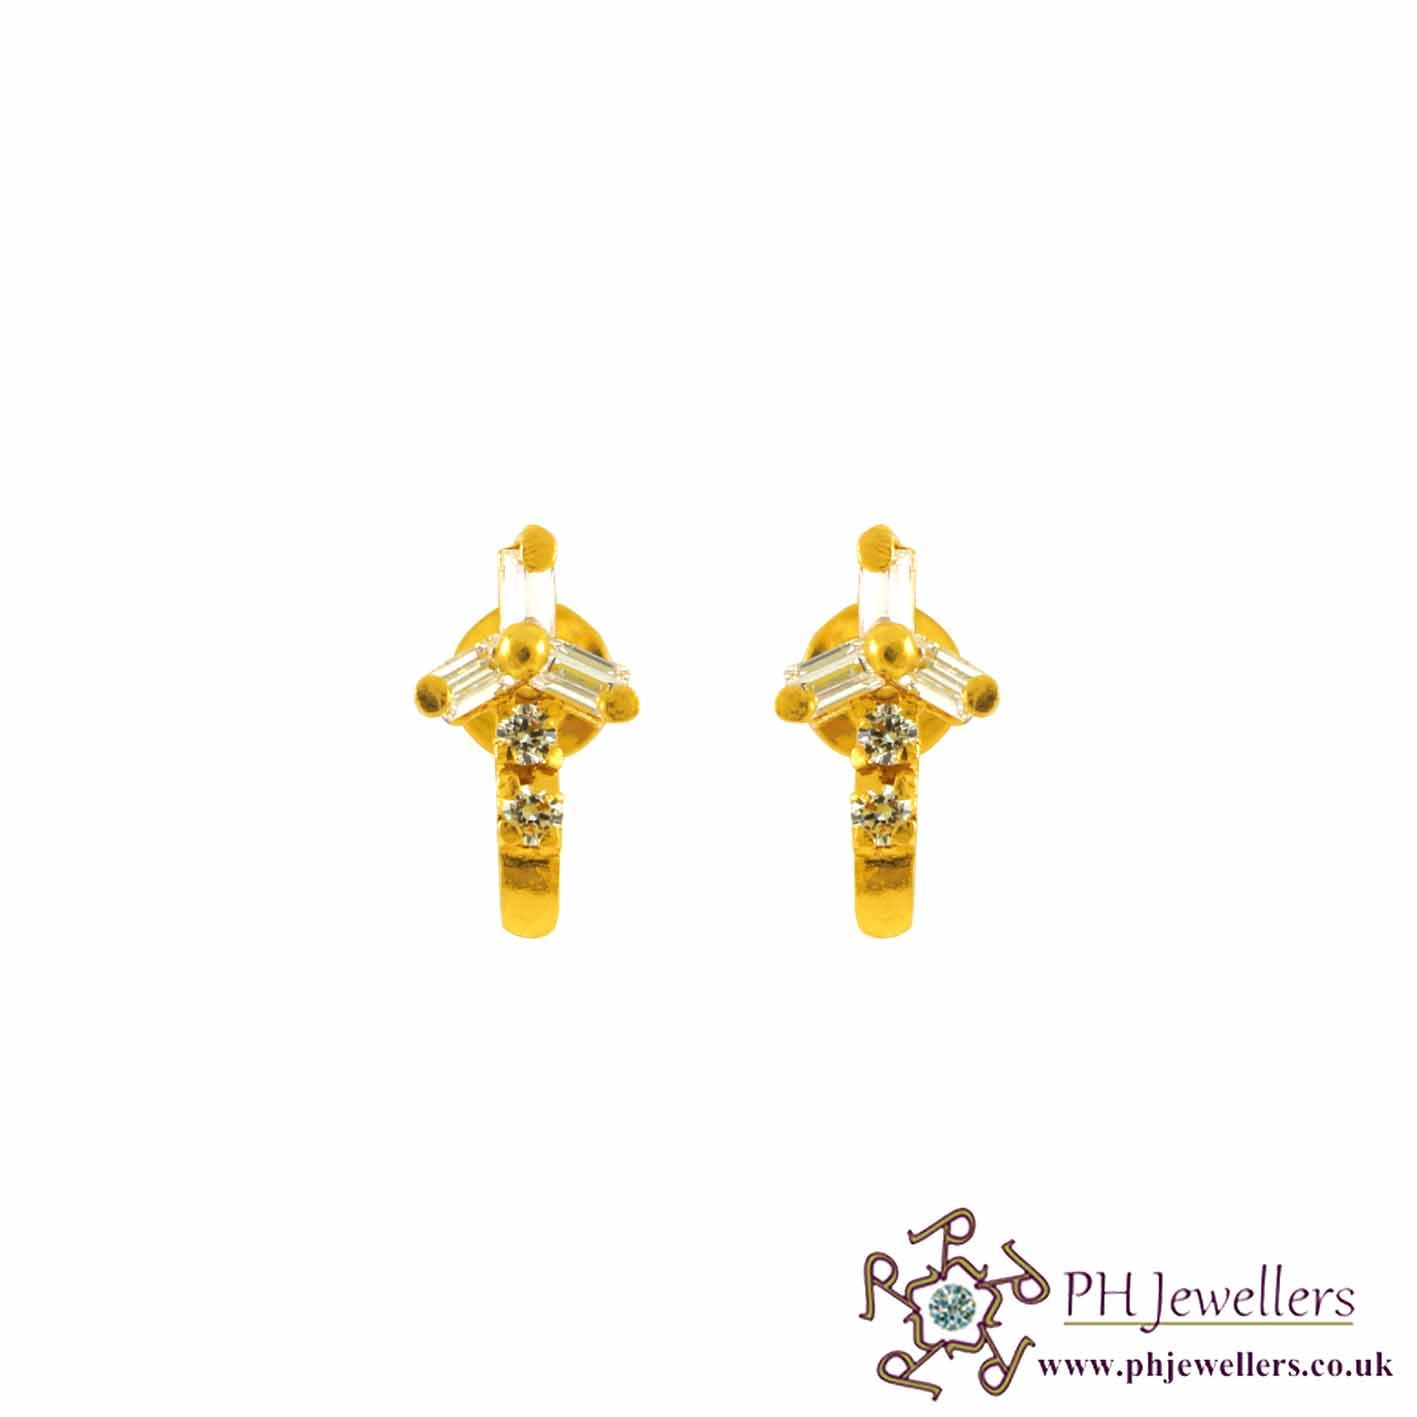 22CT 916 Yellow Gold Earring CZ SE60